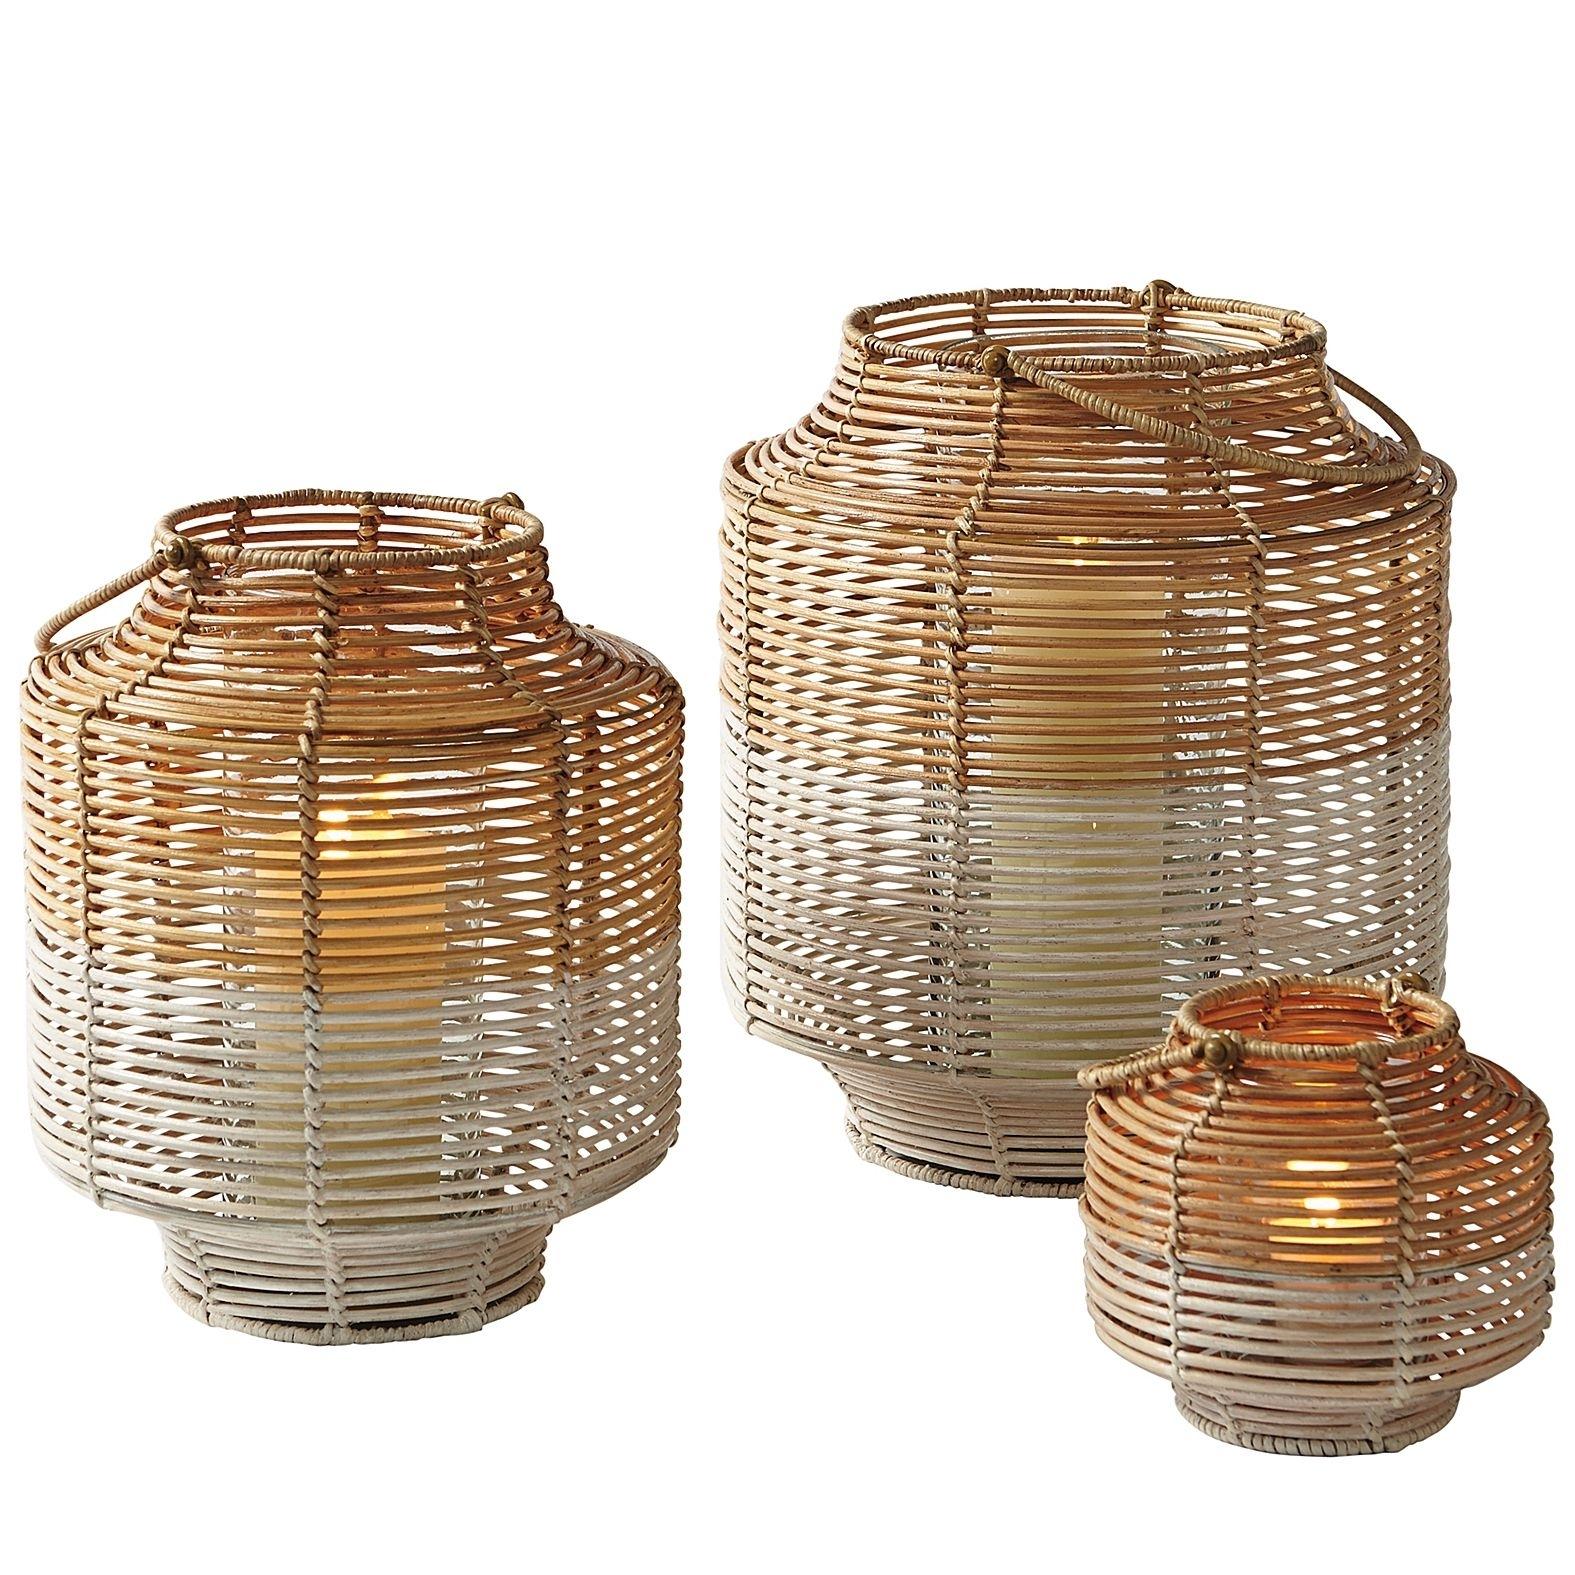 Two-Toned Rattan Lanterns – Small | Serena & Lily | Tc Sleep throughout Outdoor Rattan Lanterns (Image 20 of 20)